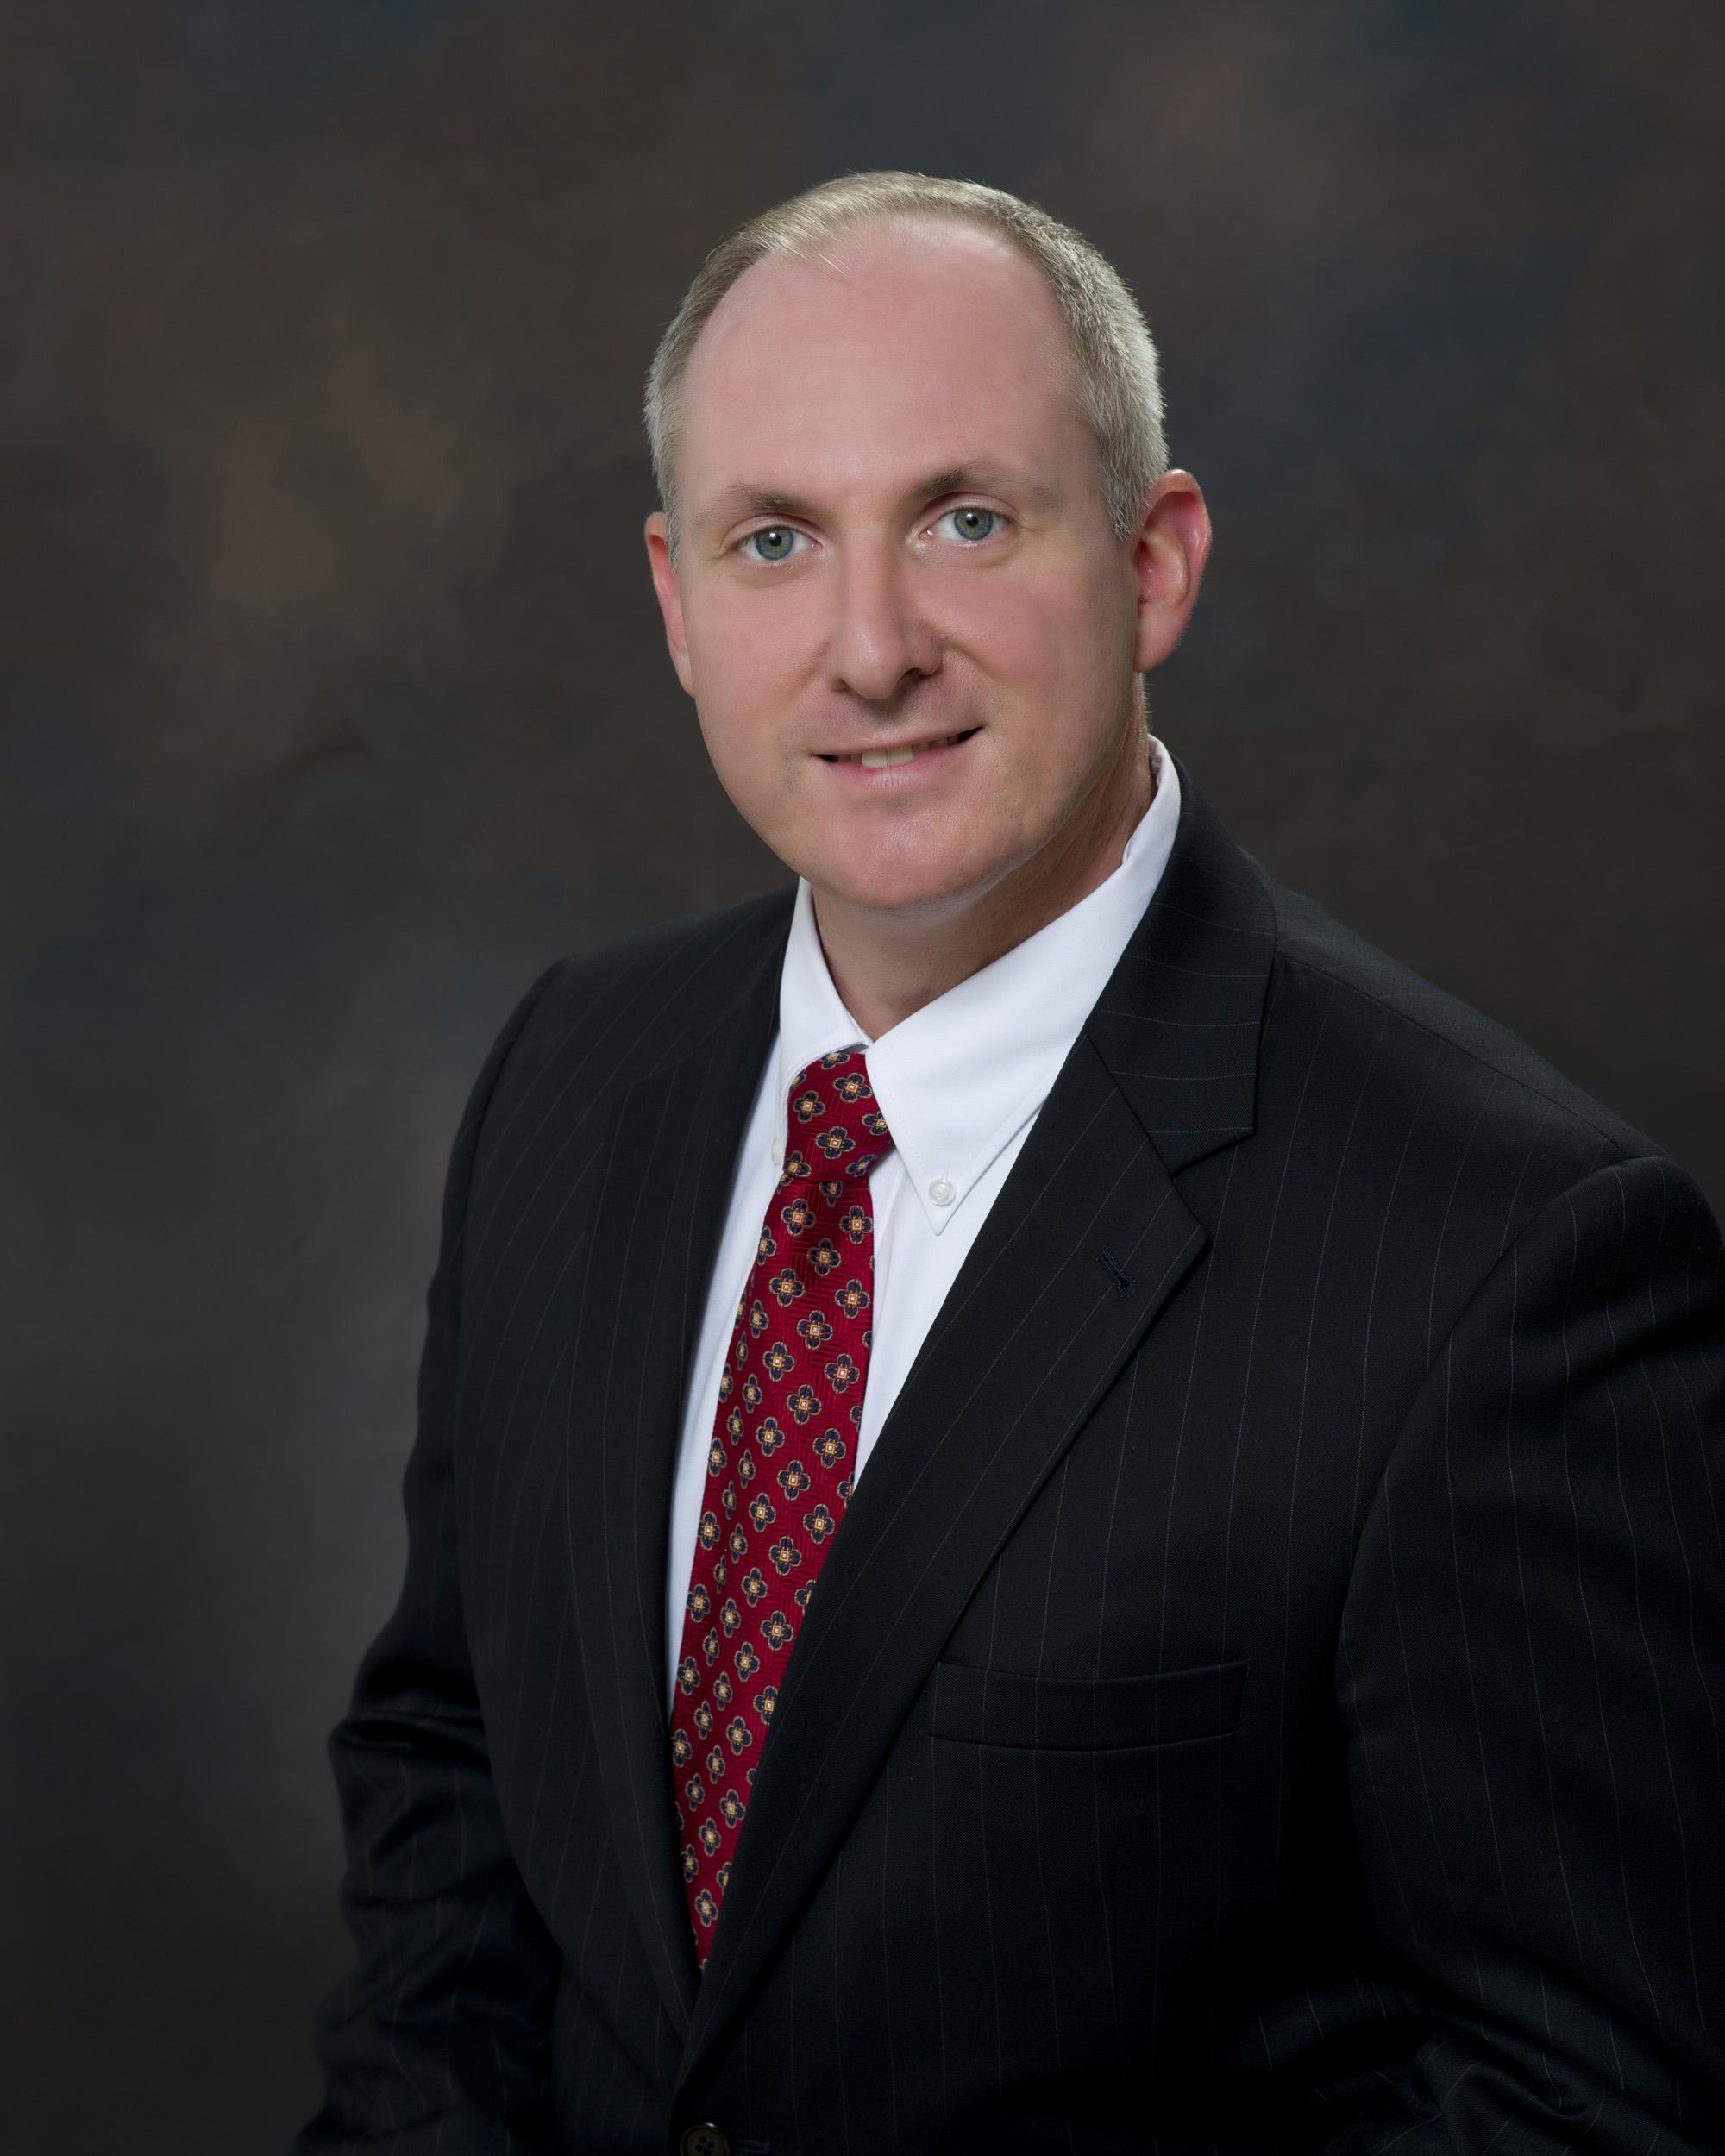 Bill Beck Law, PA